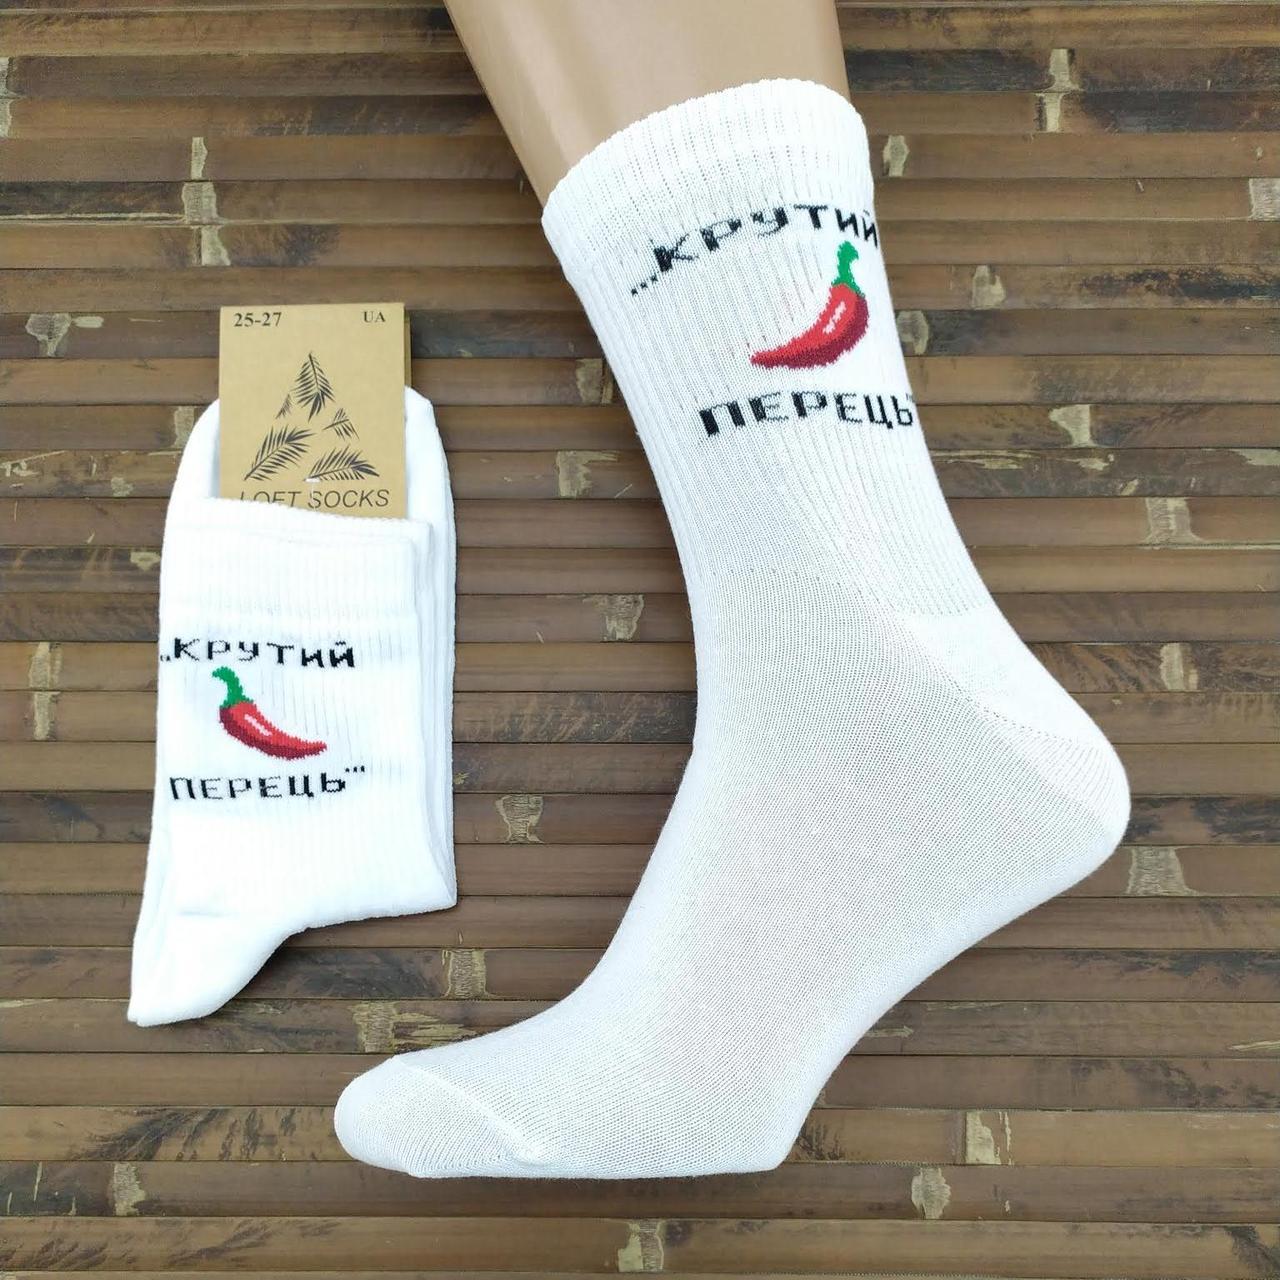 "Носки с приколами демисезонные, LOFT SOCKS, 25-27р, ""Крутий перець"", белые, 20029272"